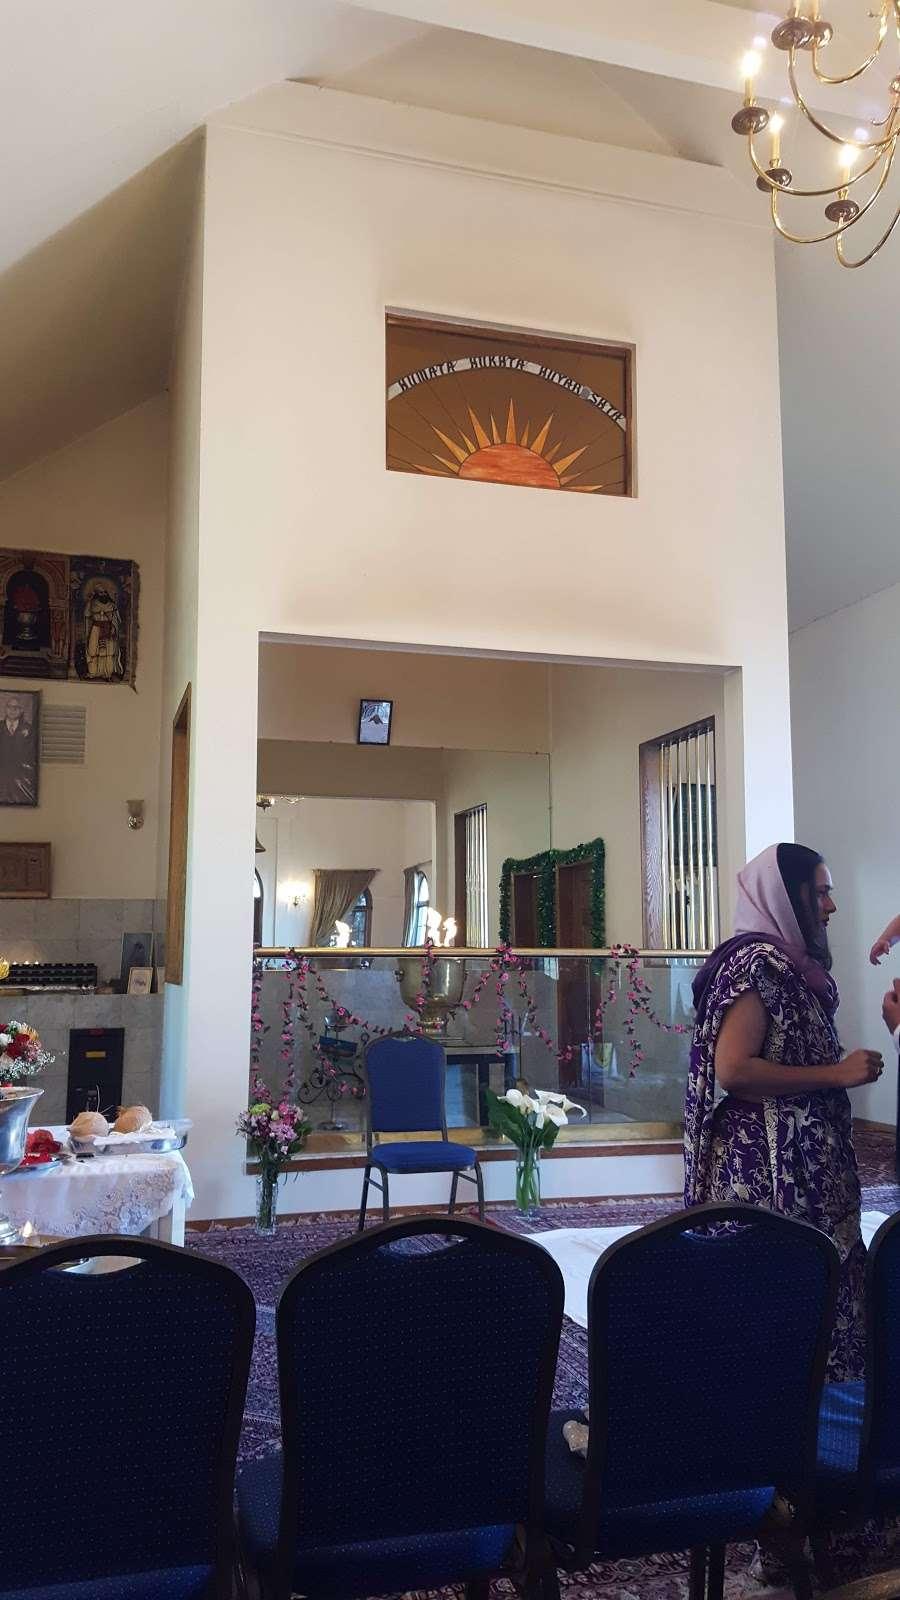 Zoroastrian Temple - church  | Photo 4 of 10 | Address: 10468 Crothers Rd, San Jose, CA 95127, USA | Phone: (408) 272-1678